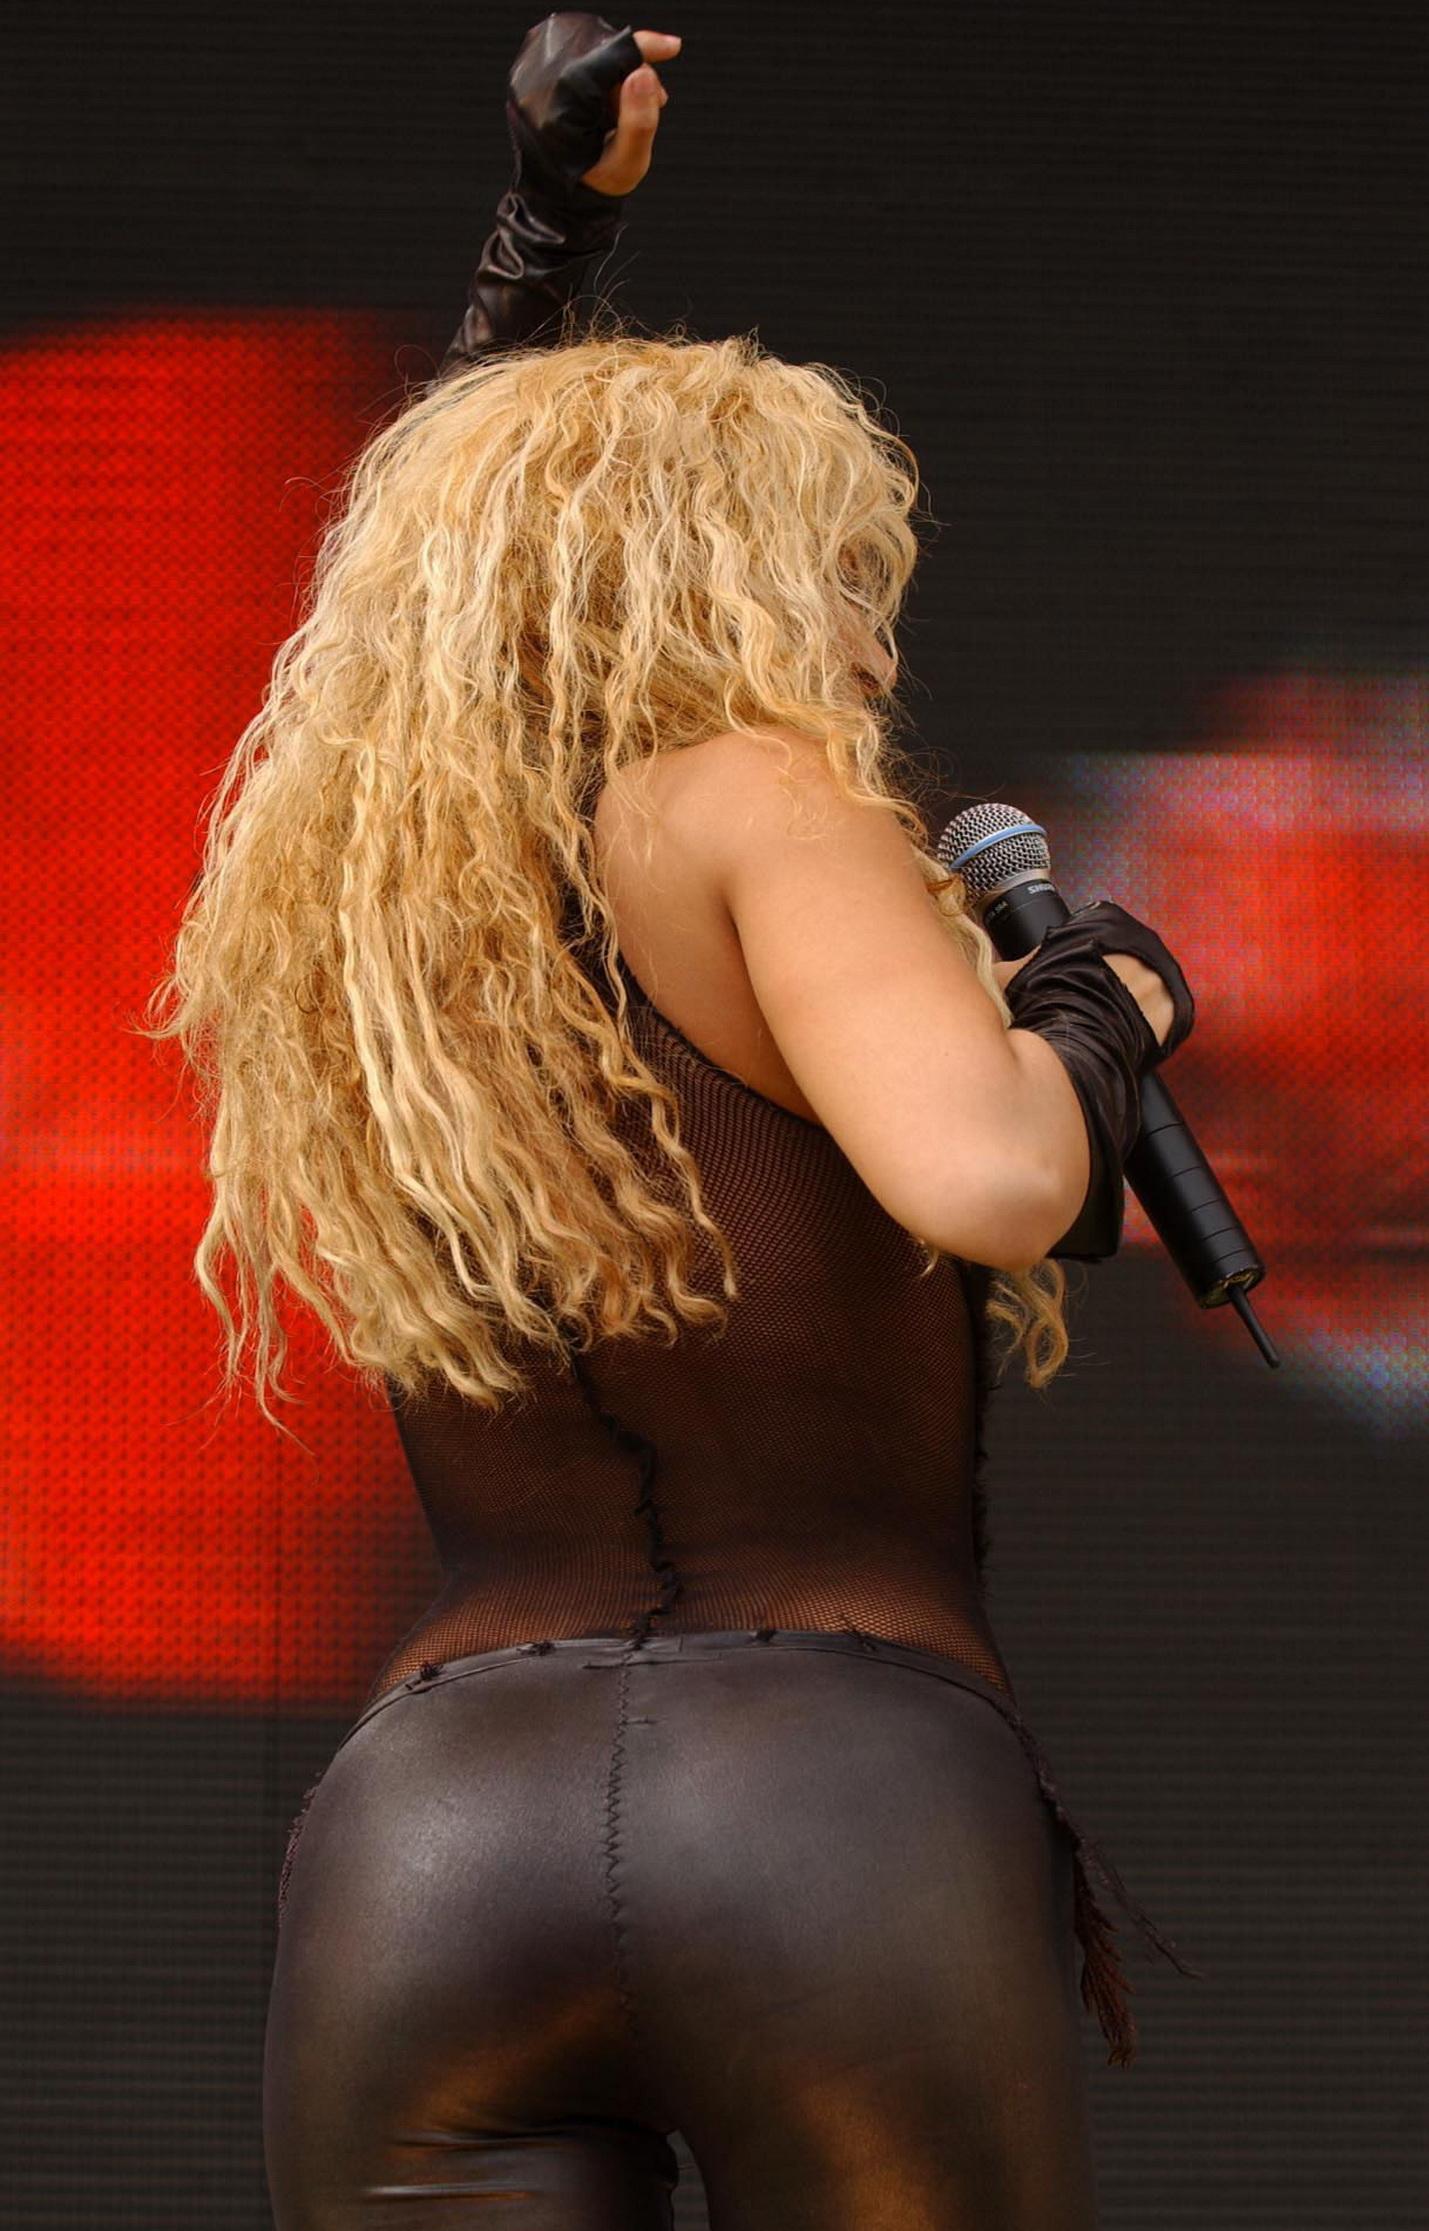 Шакира жопа фото 4 фотография